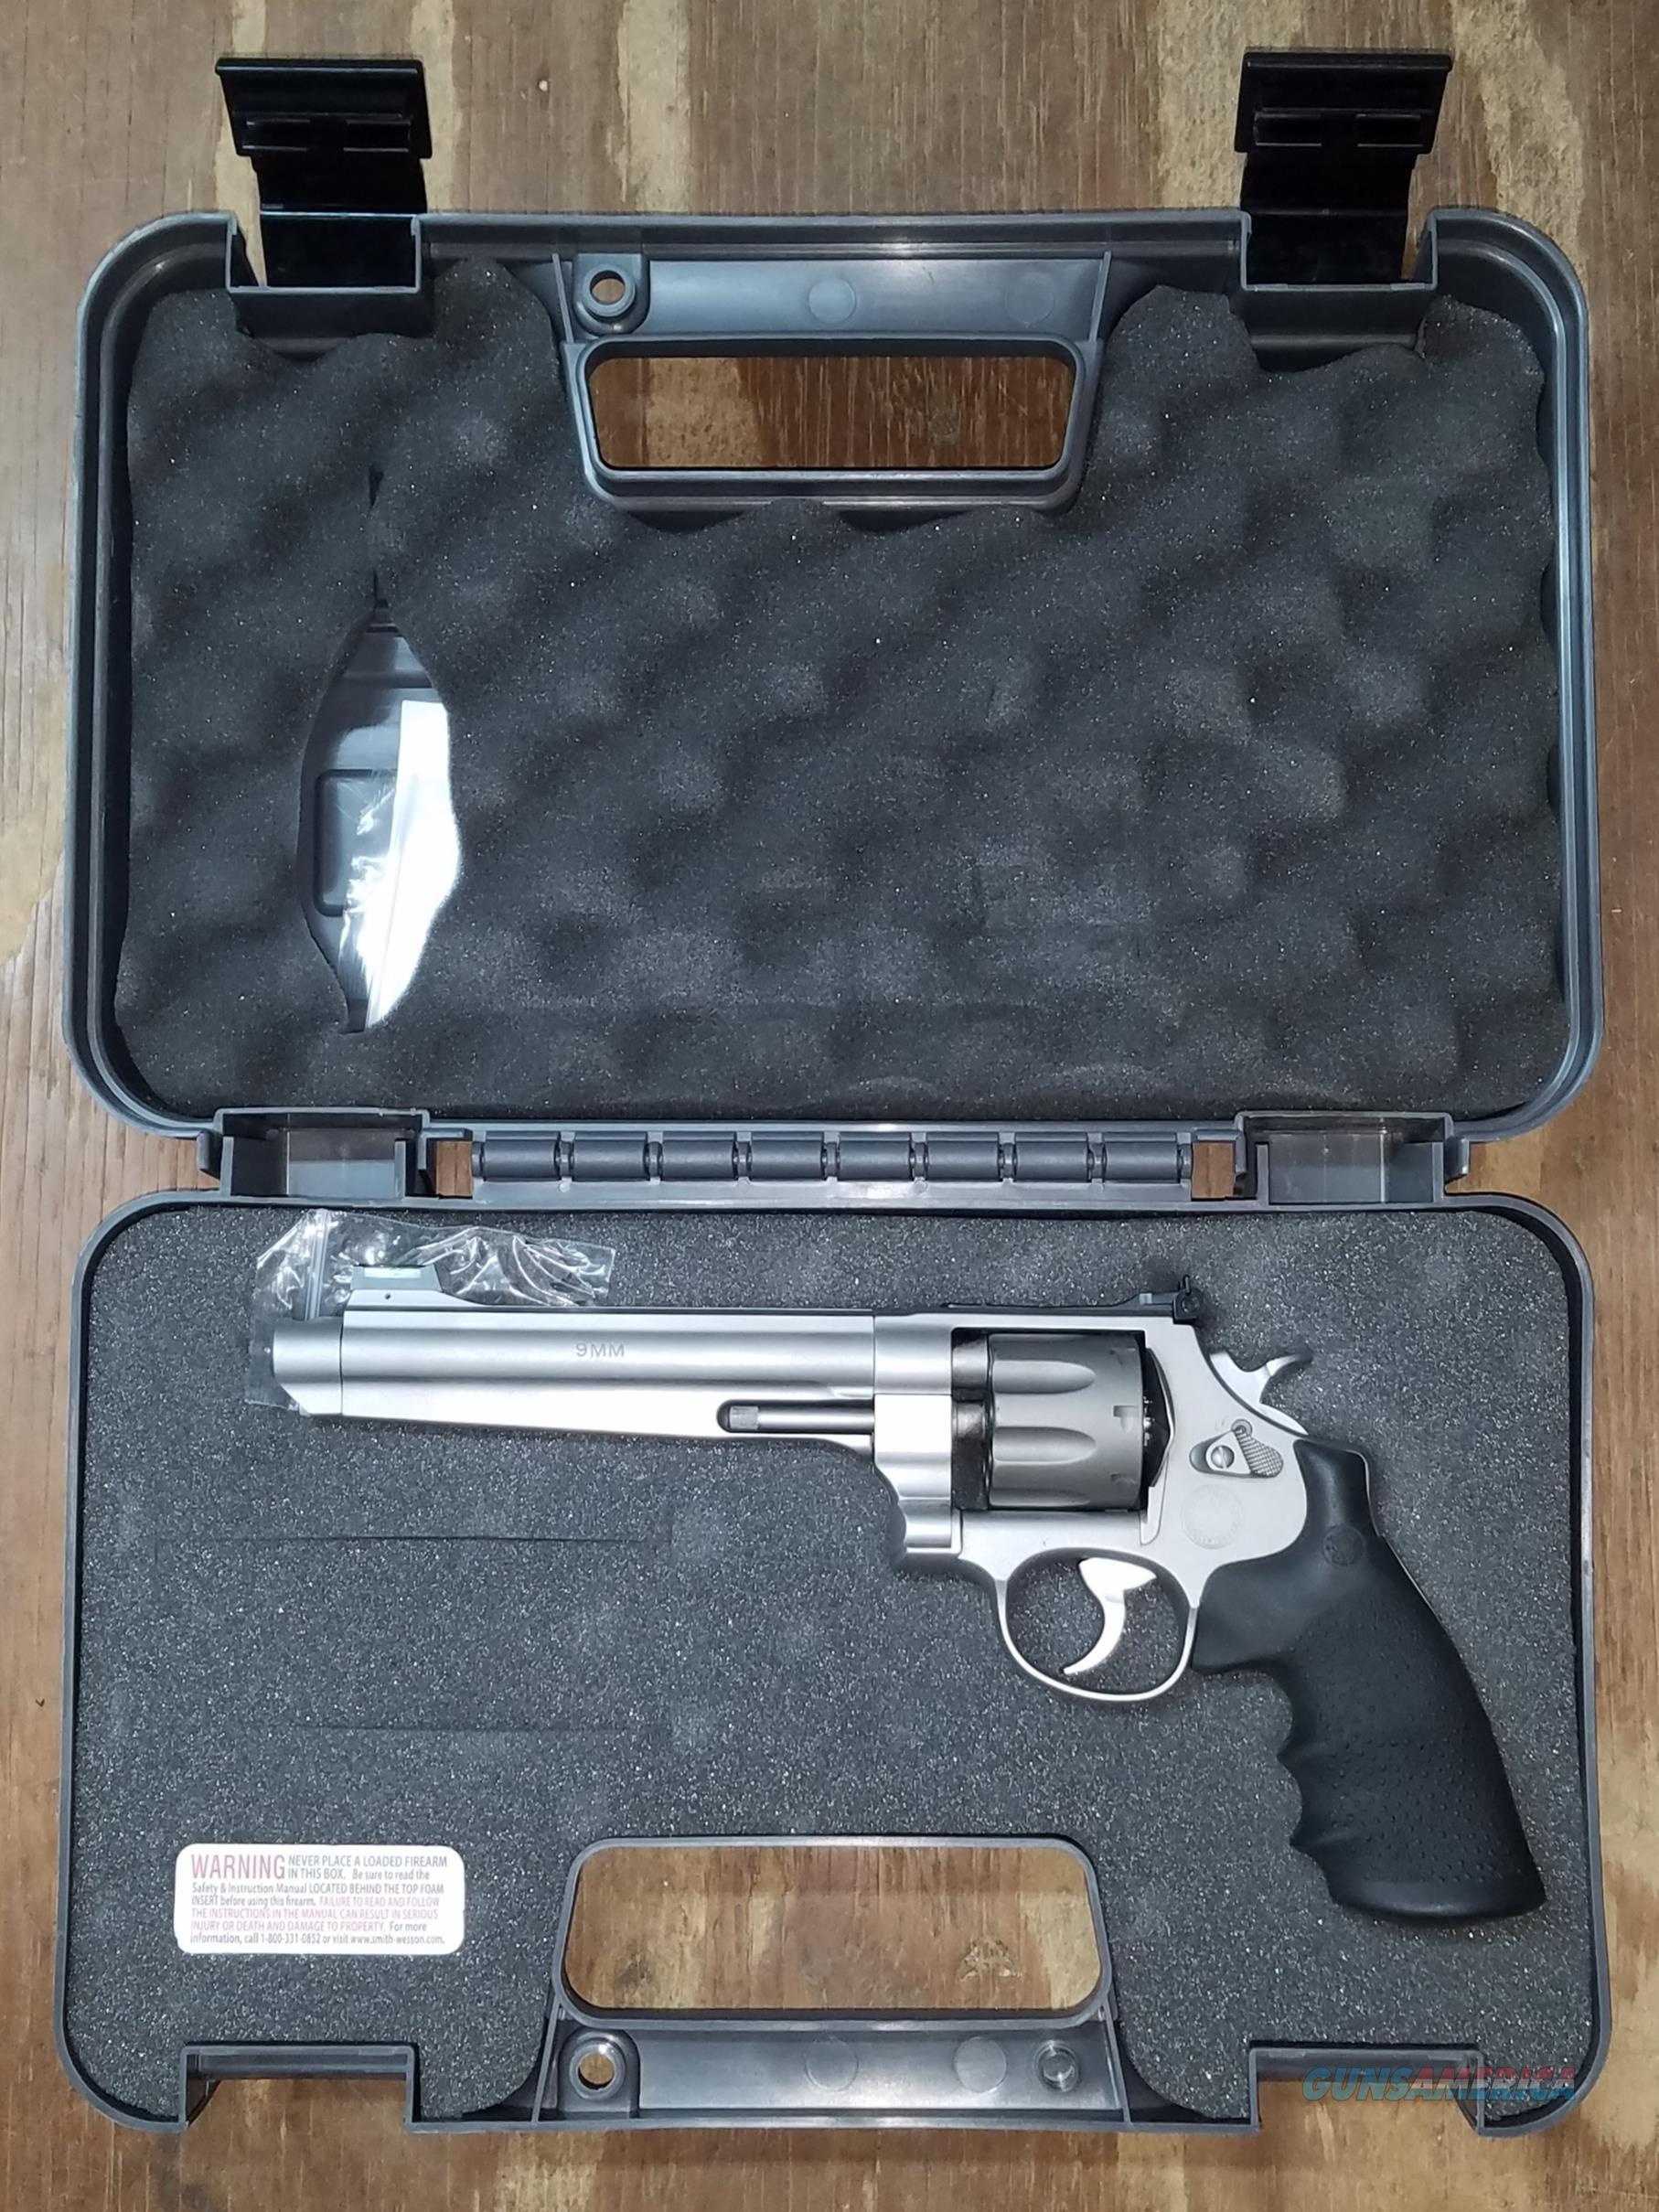 Smith & Wesson Model 929 9MM Revolver 170341  Guns > Pistols > Smith & Wesson Revolvers > Performance Center